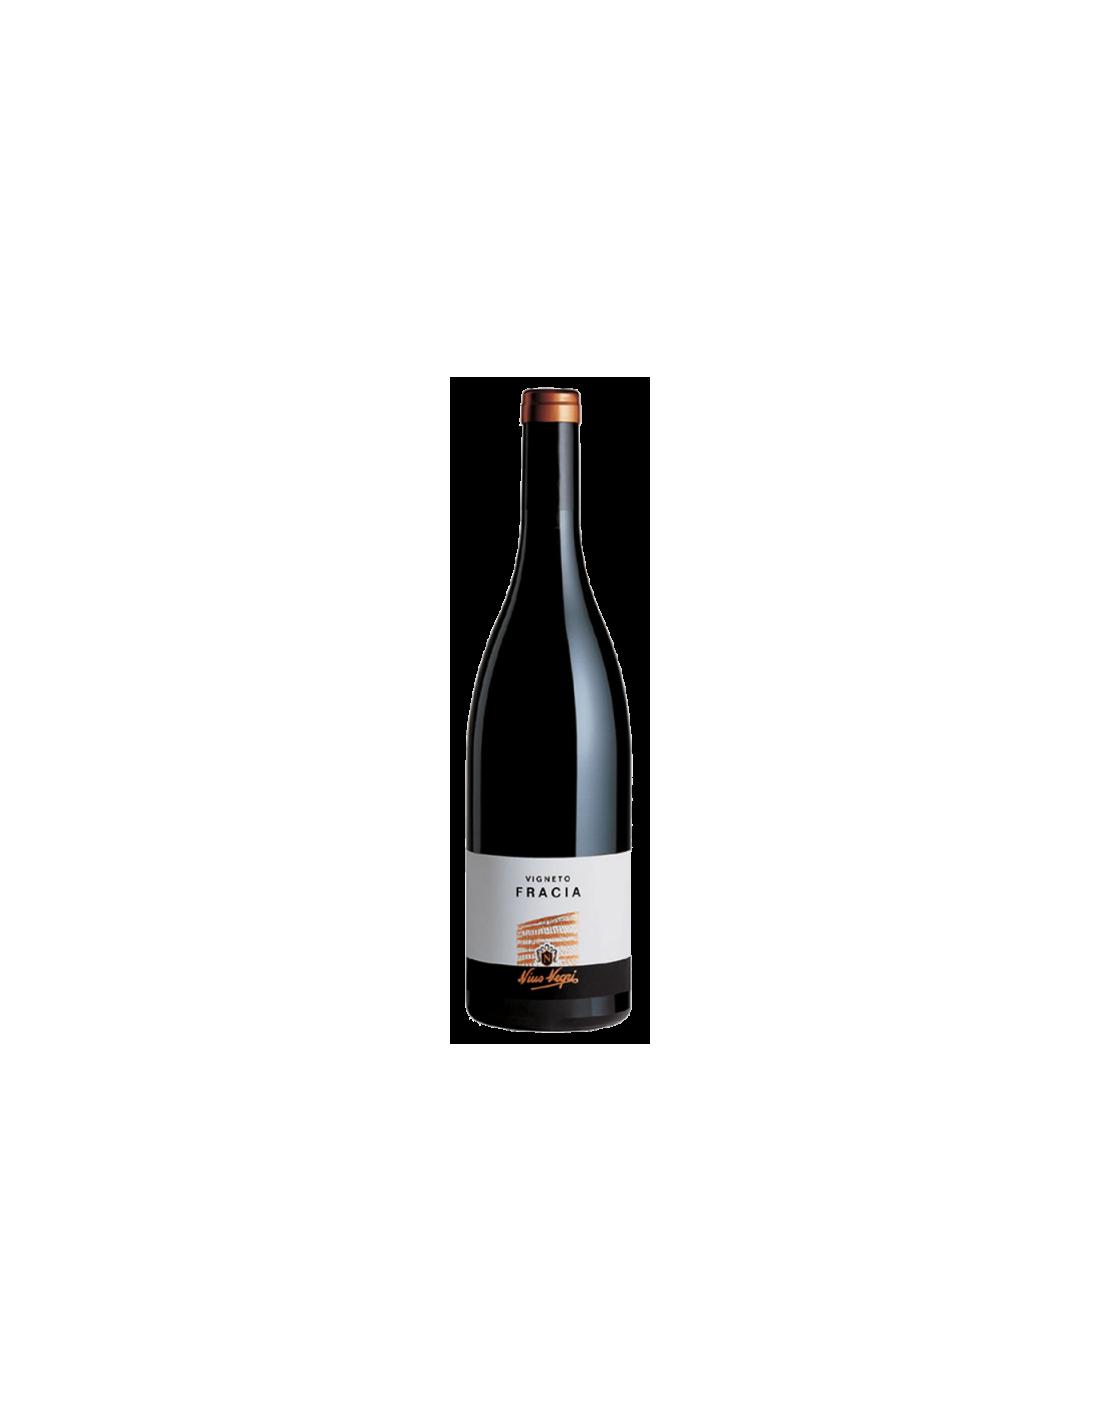 Vin rosu, Nino Negri Fracia Vigneto, 13.5% alc., 0,75L, Italia